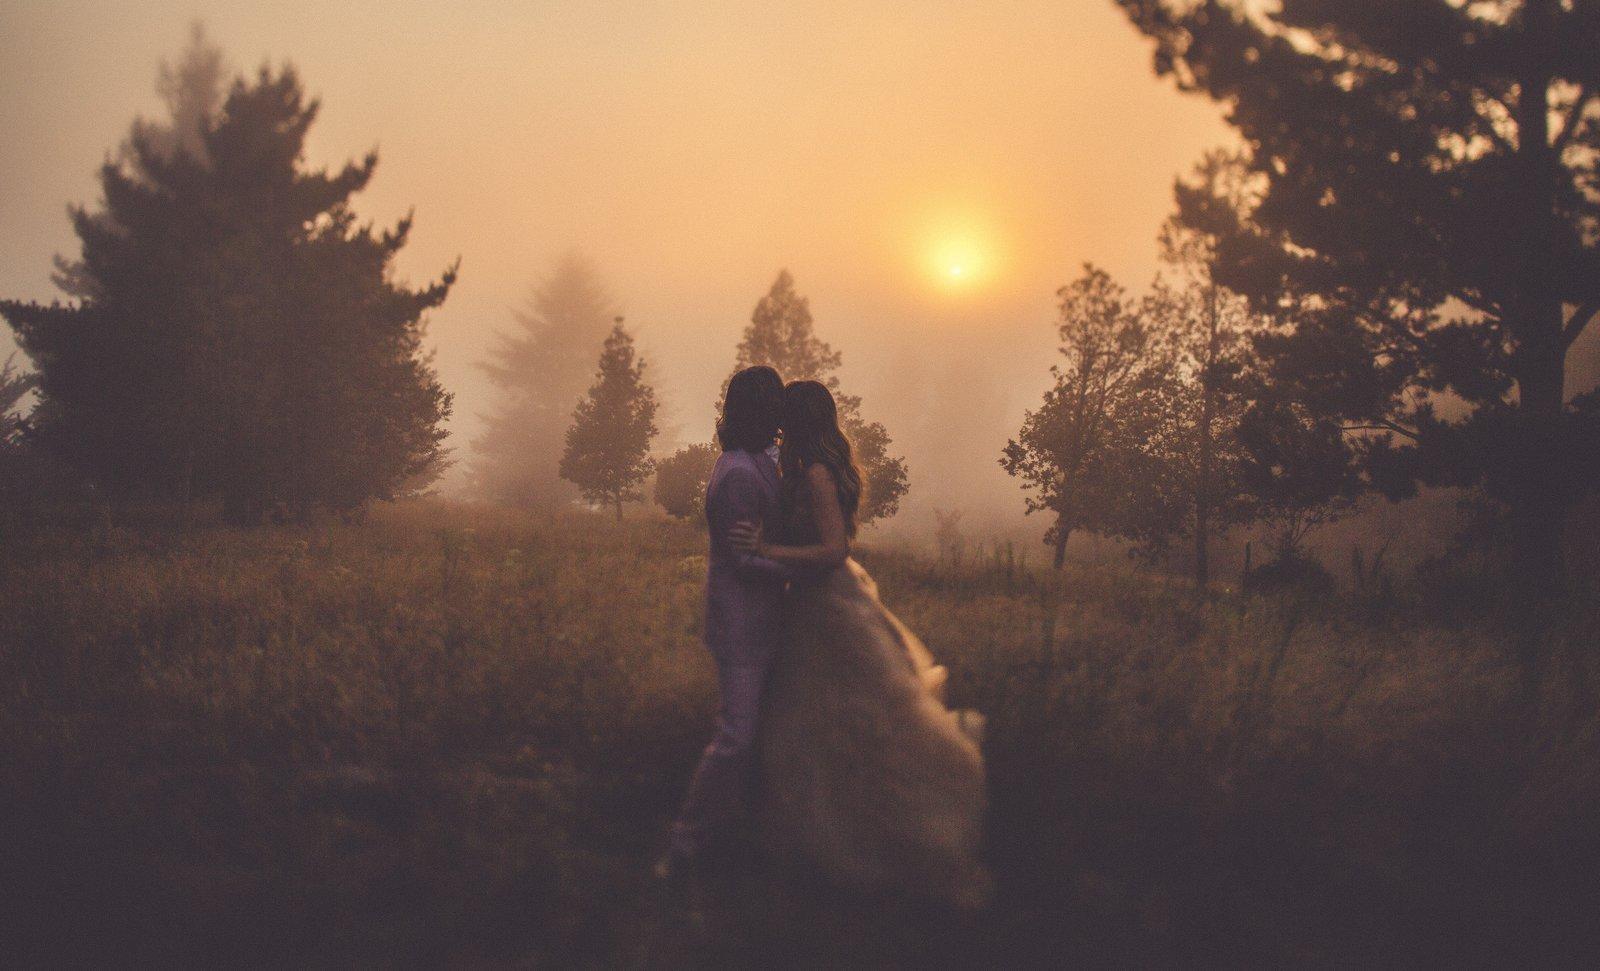 Elizabeth Paige Smith and Christopher Stringer wedding